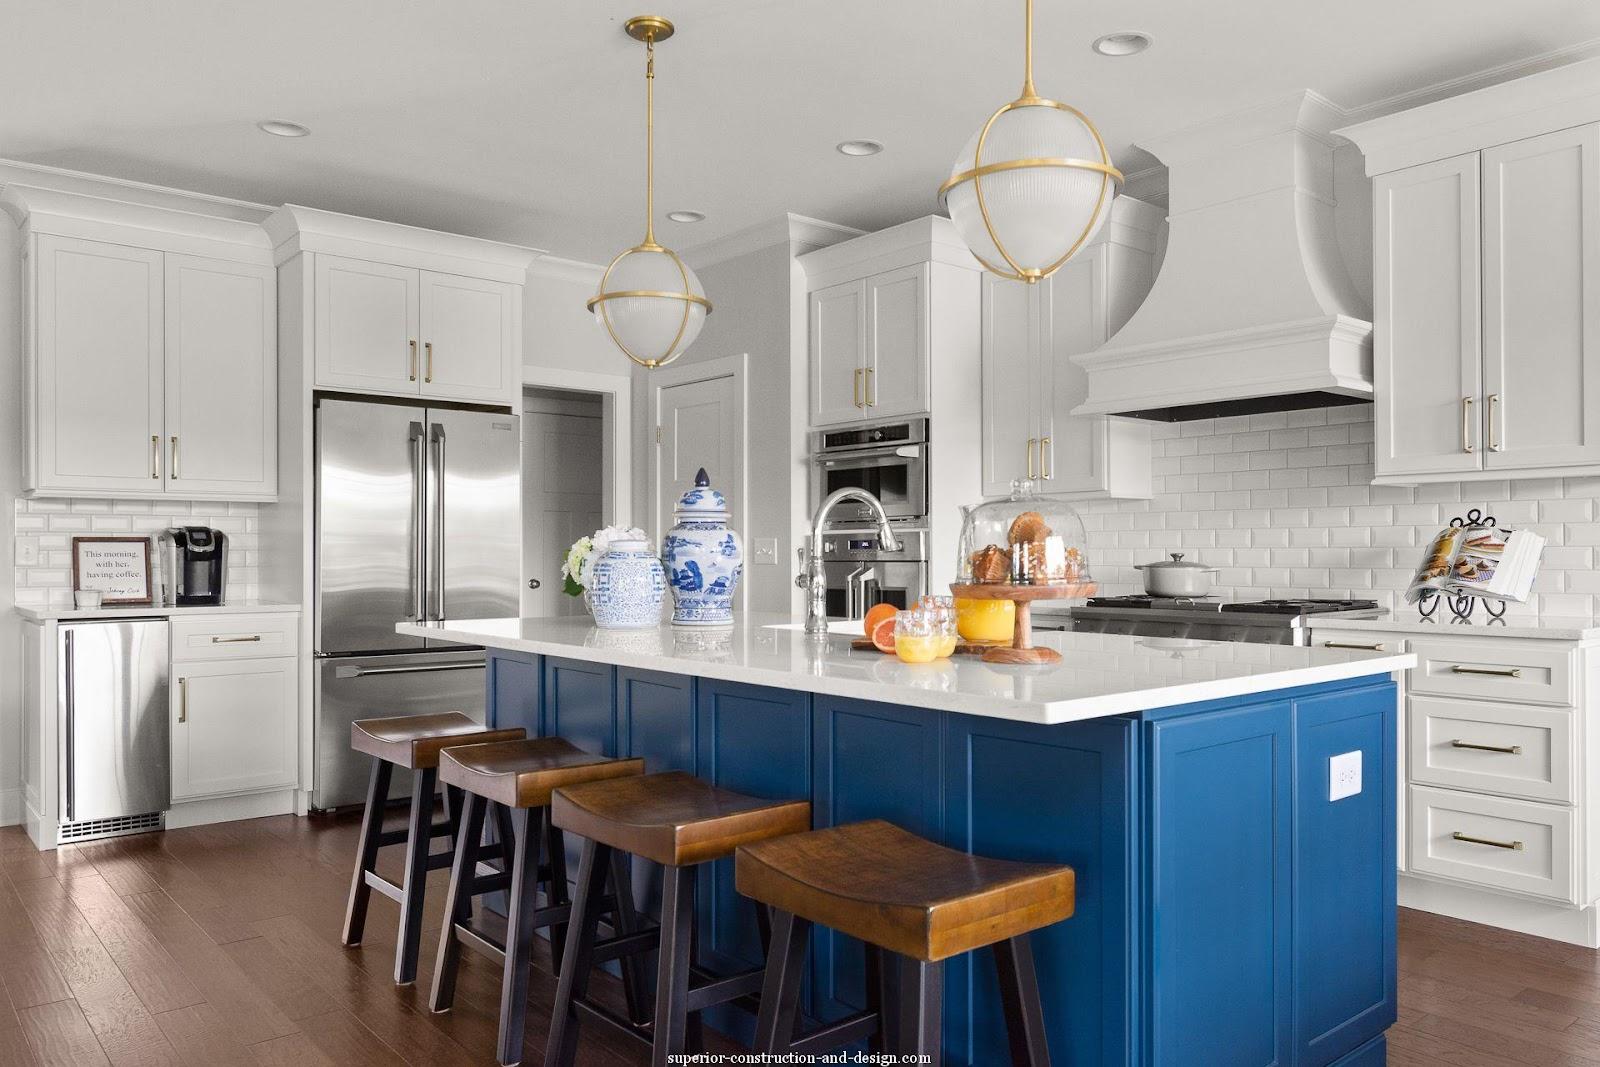 pebble point new build lake home kitchen design white blue crisp timeless traditional